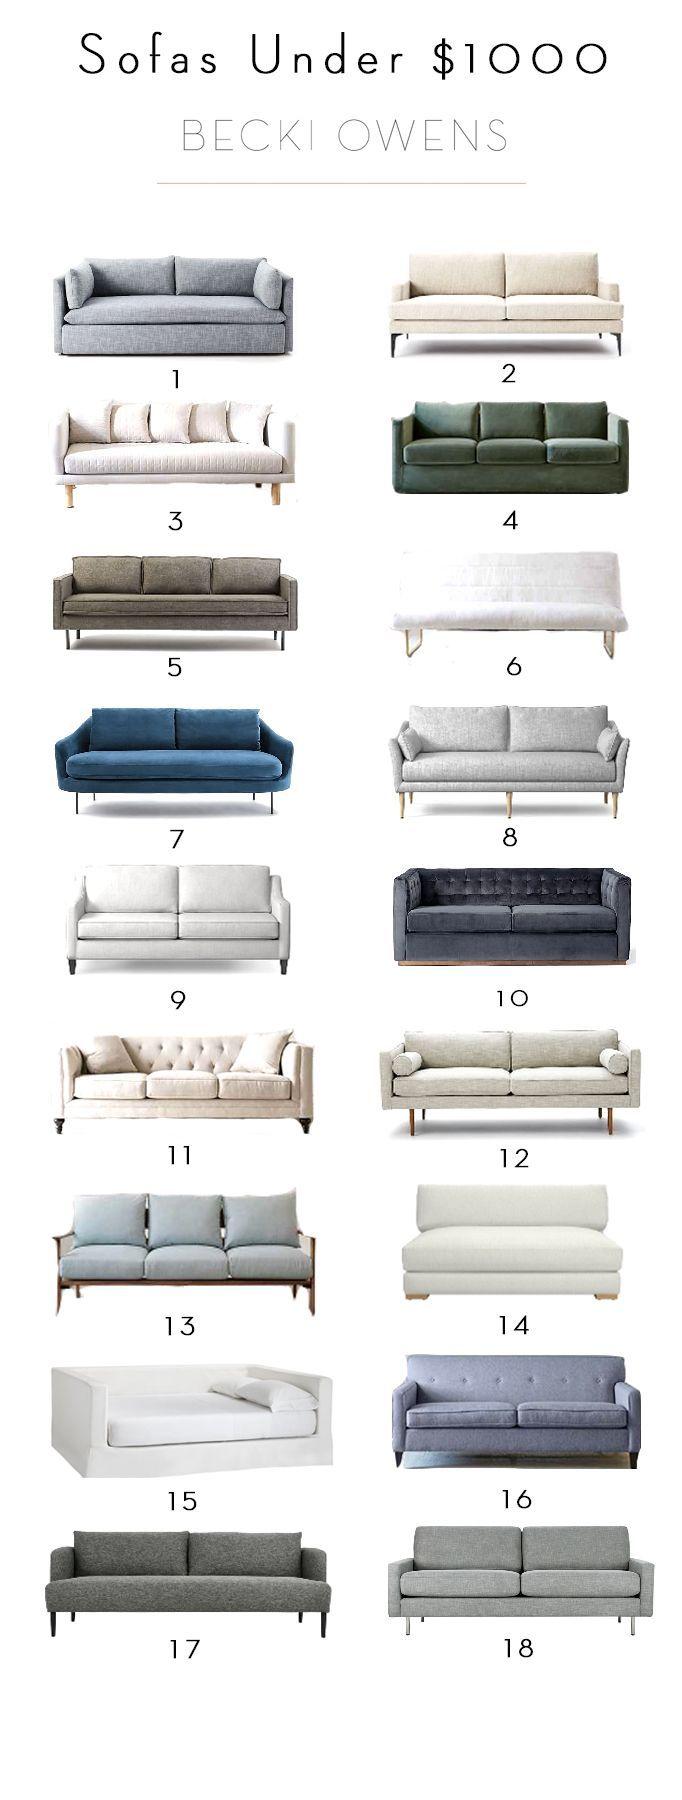 Best 25 Sofa sales ideas on Pinterest